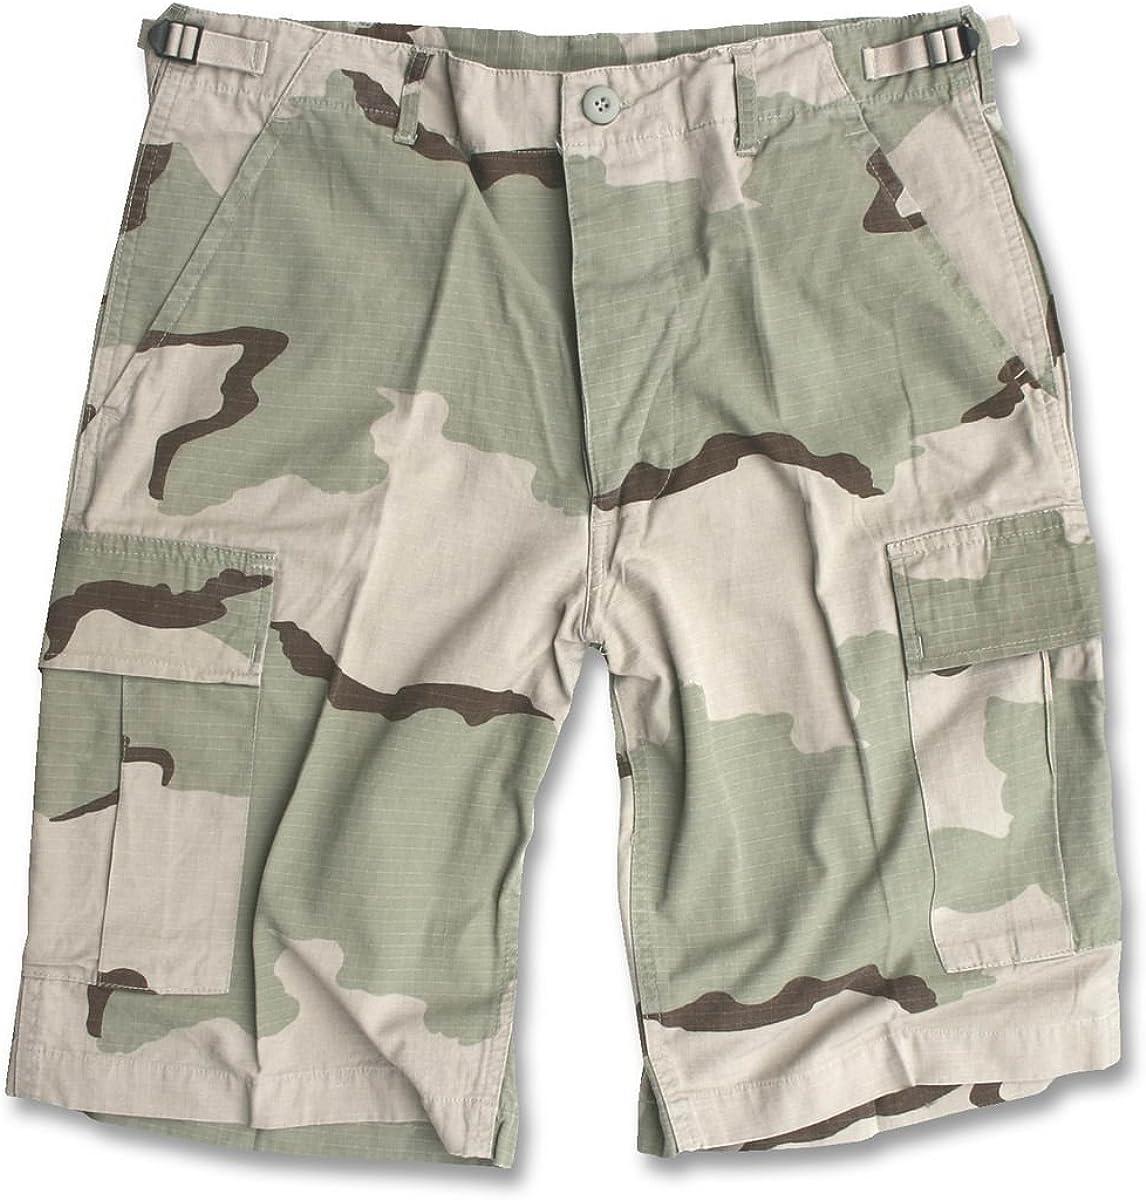 Camooutdoor Mens Bermuda Ripstop Cargo Combat Army Style Shorts Fishing Desert